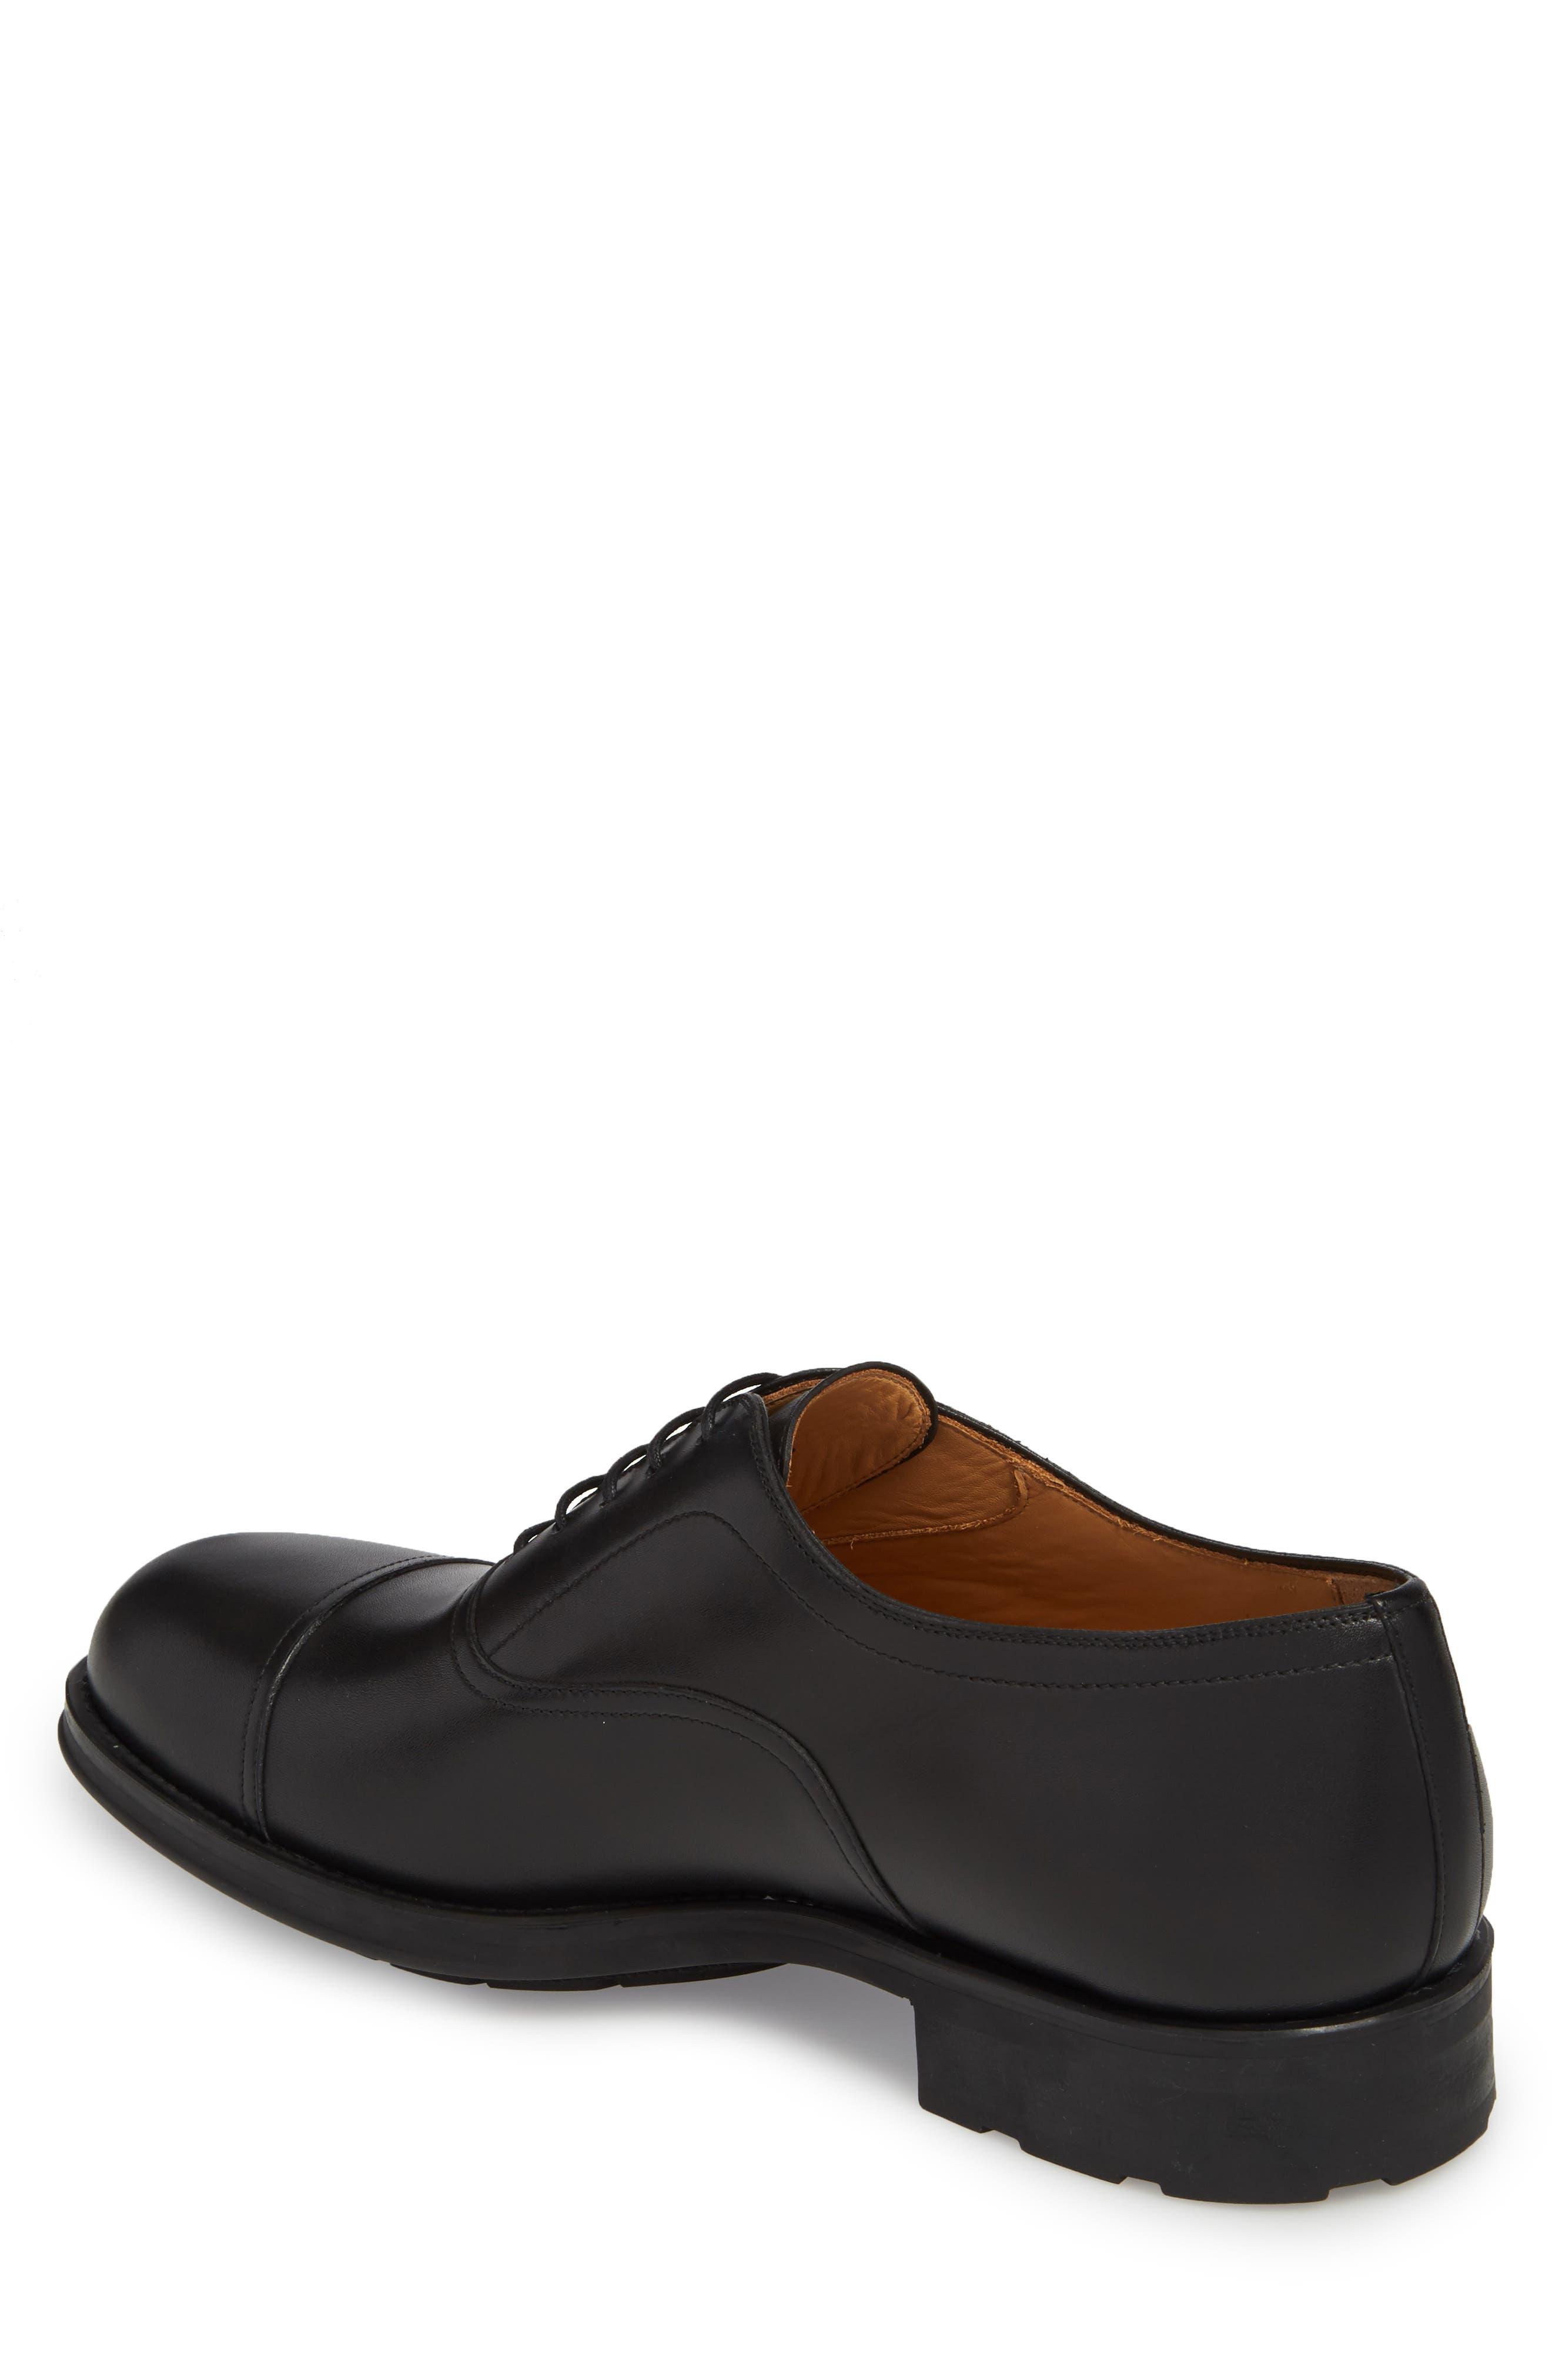 Tadeo Cap Toe Oxford,                             Alternate thumbnail 2, color,                             Black Leather